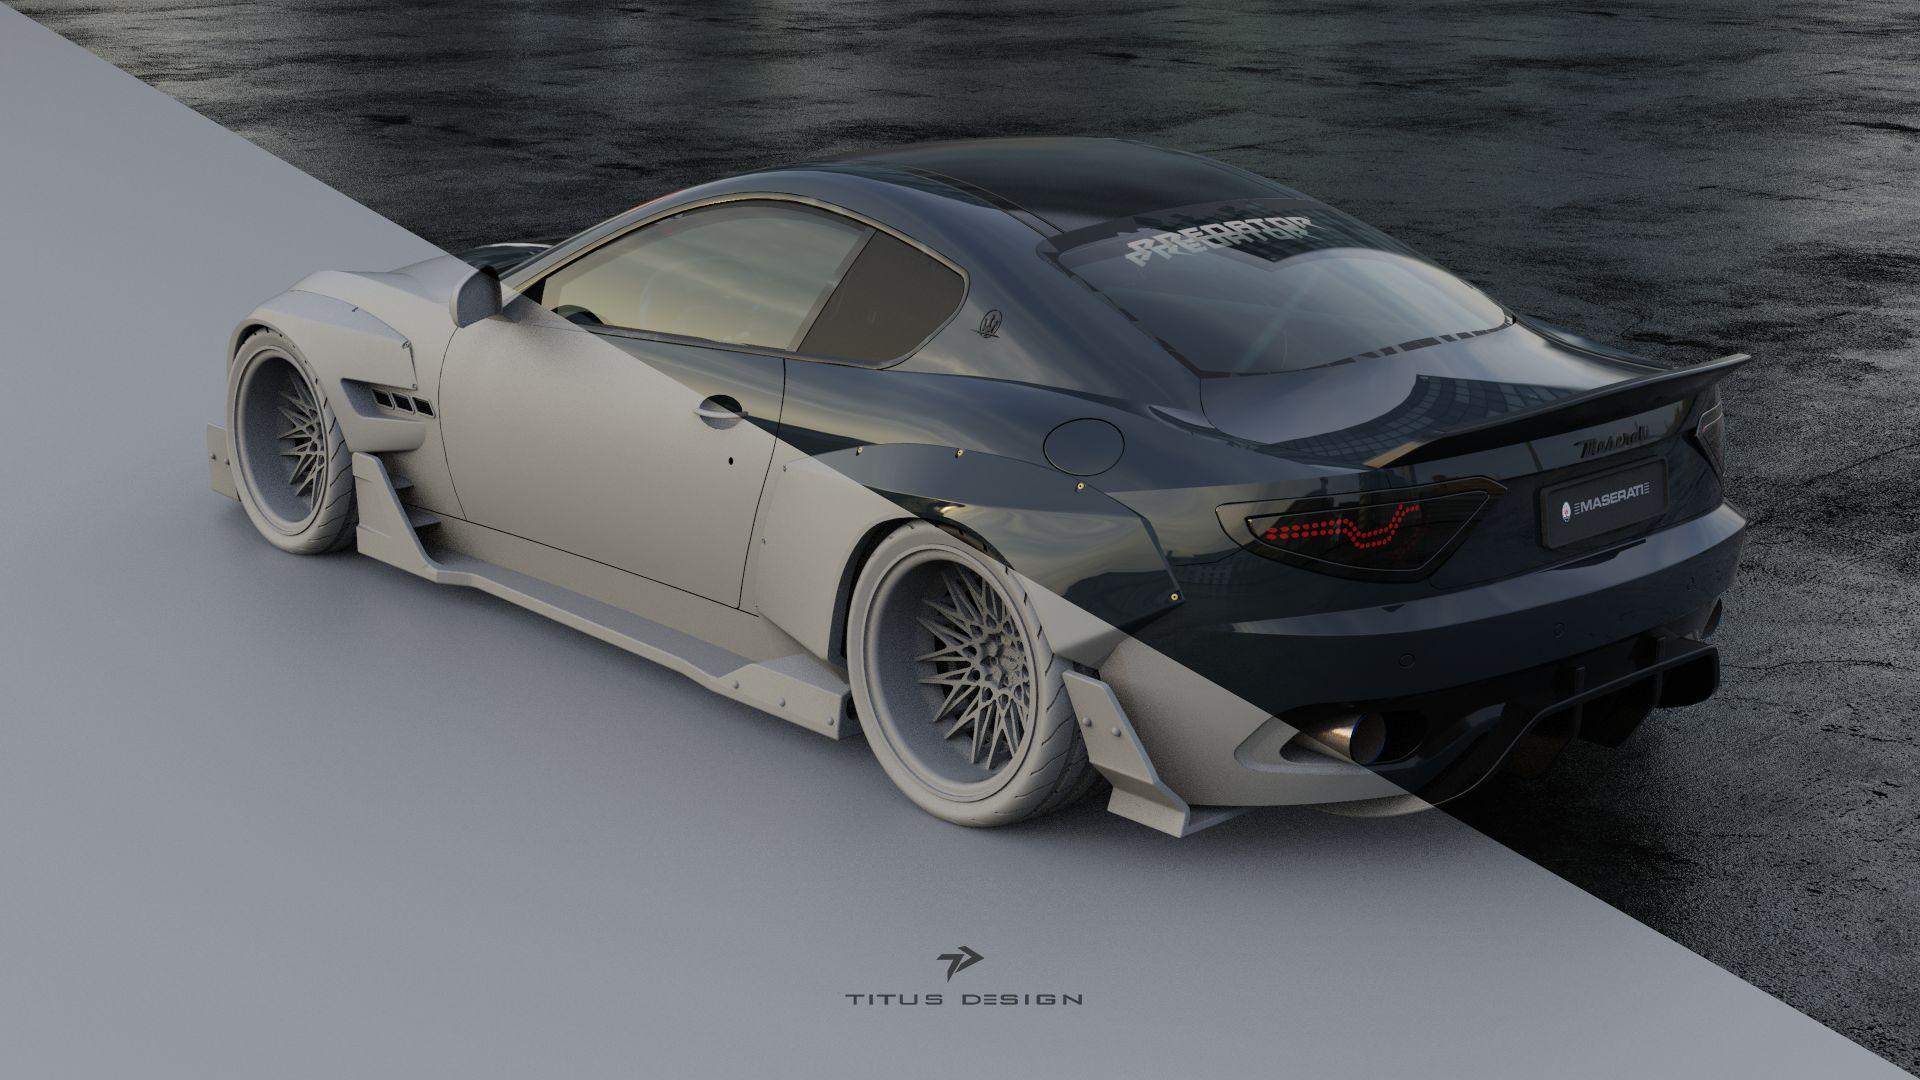 Maserati-gt-16-1-3500-3500